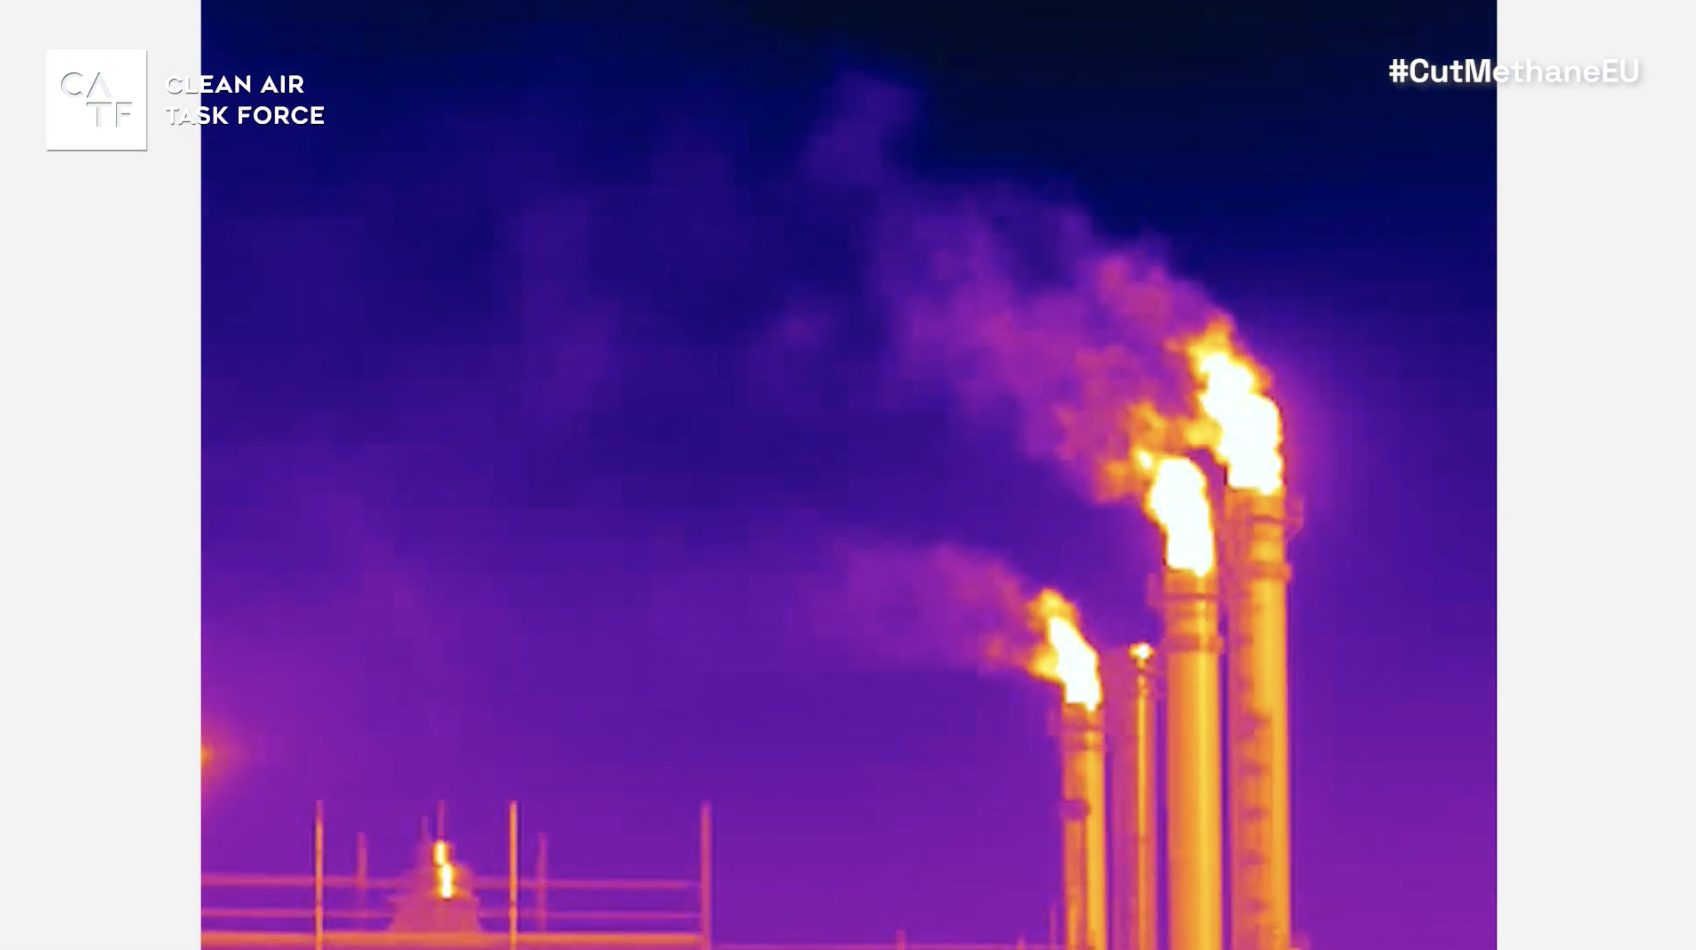 perdite di metano